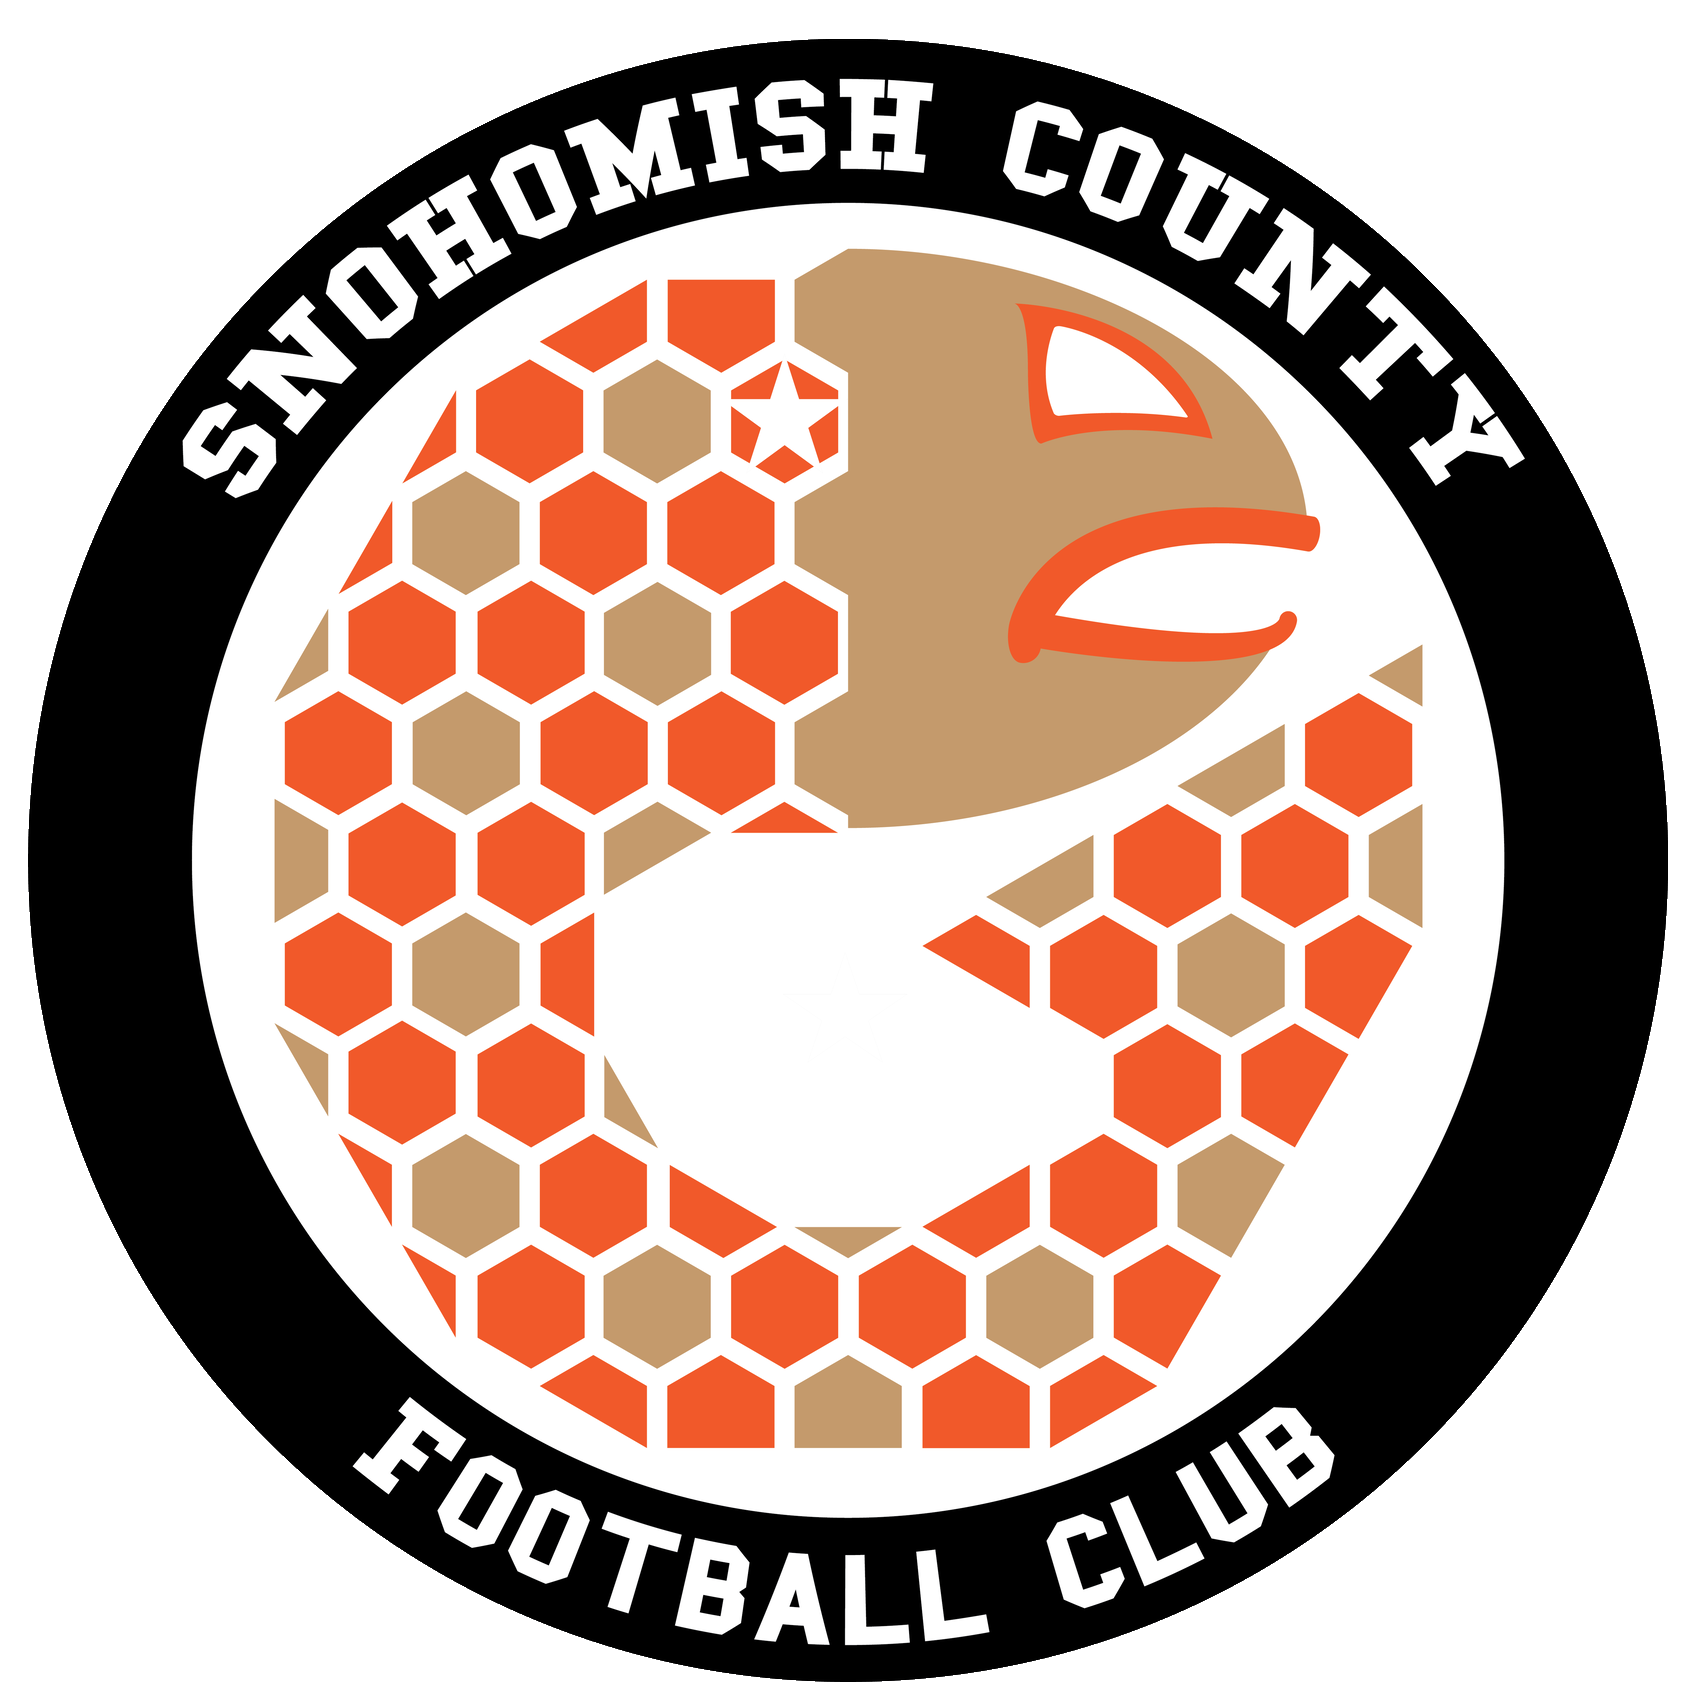 Snohomish County Football Club